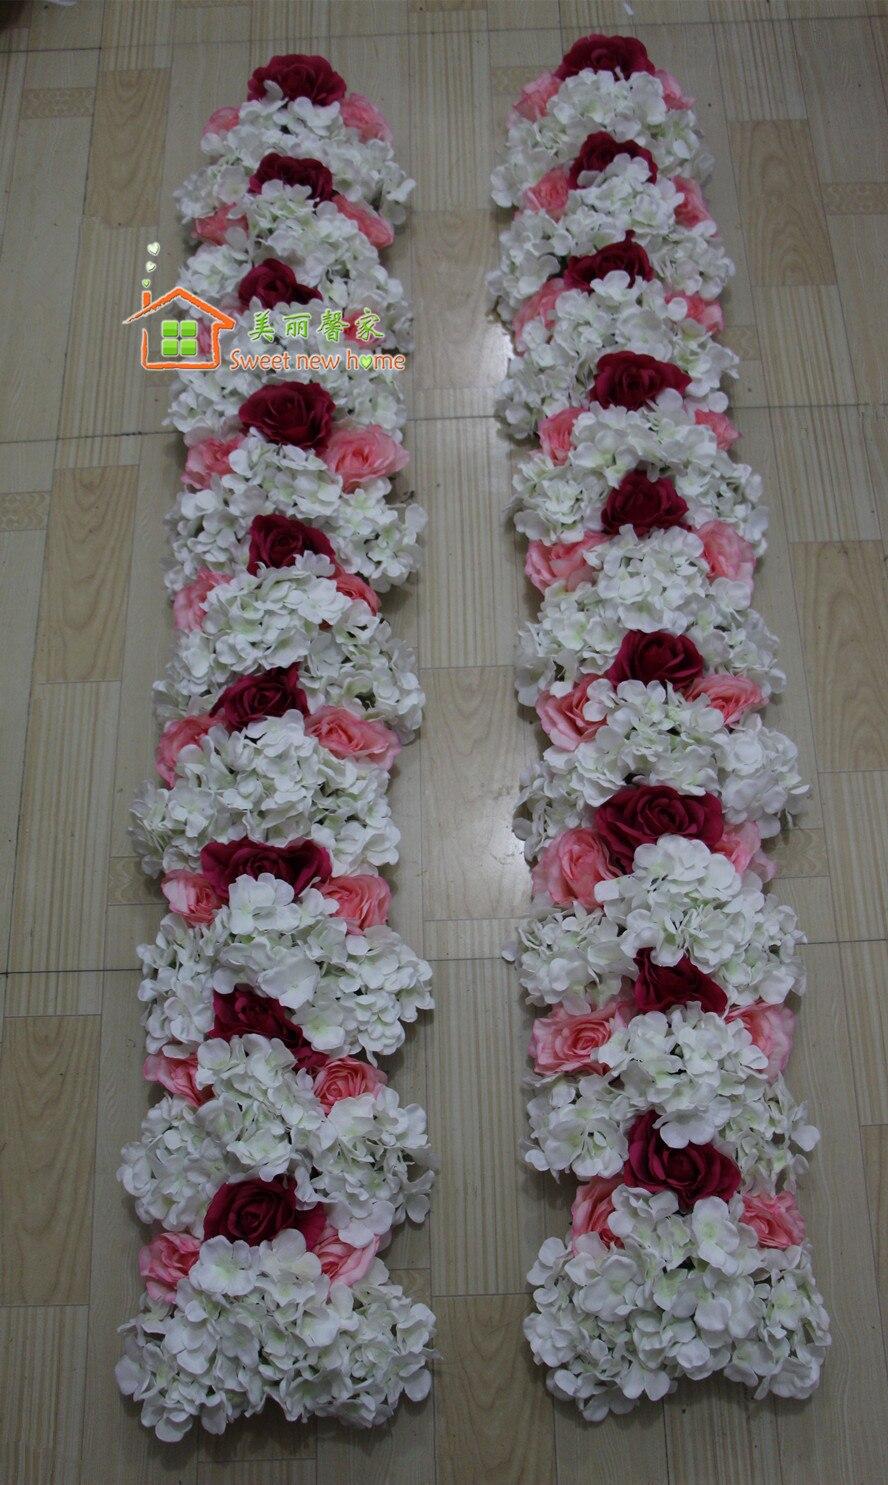 Sweet New Home Wedding Artificial Flower Table Centerpiece Flower